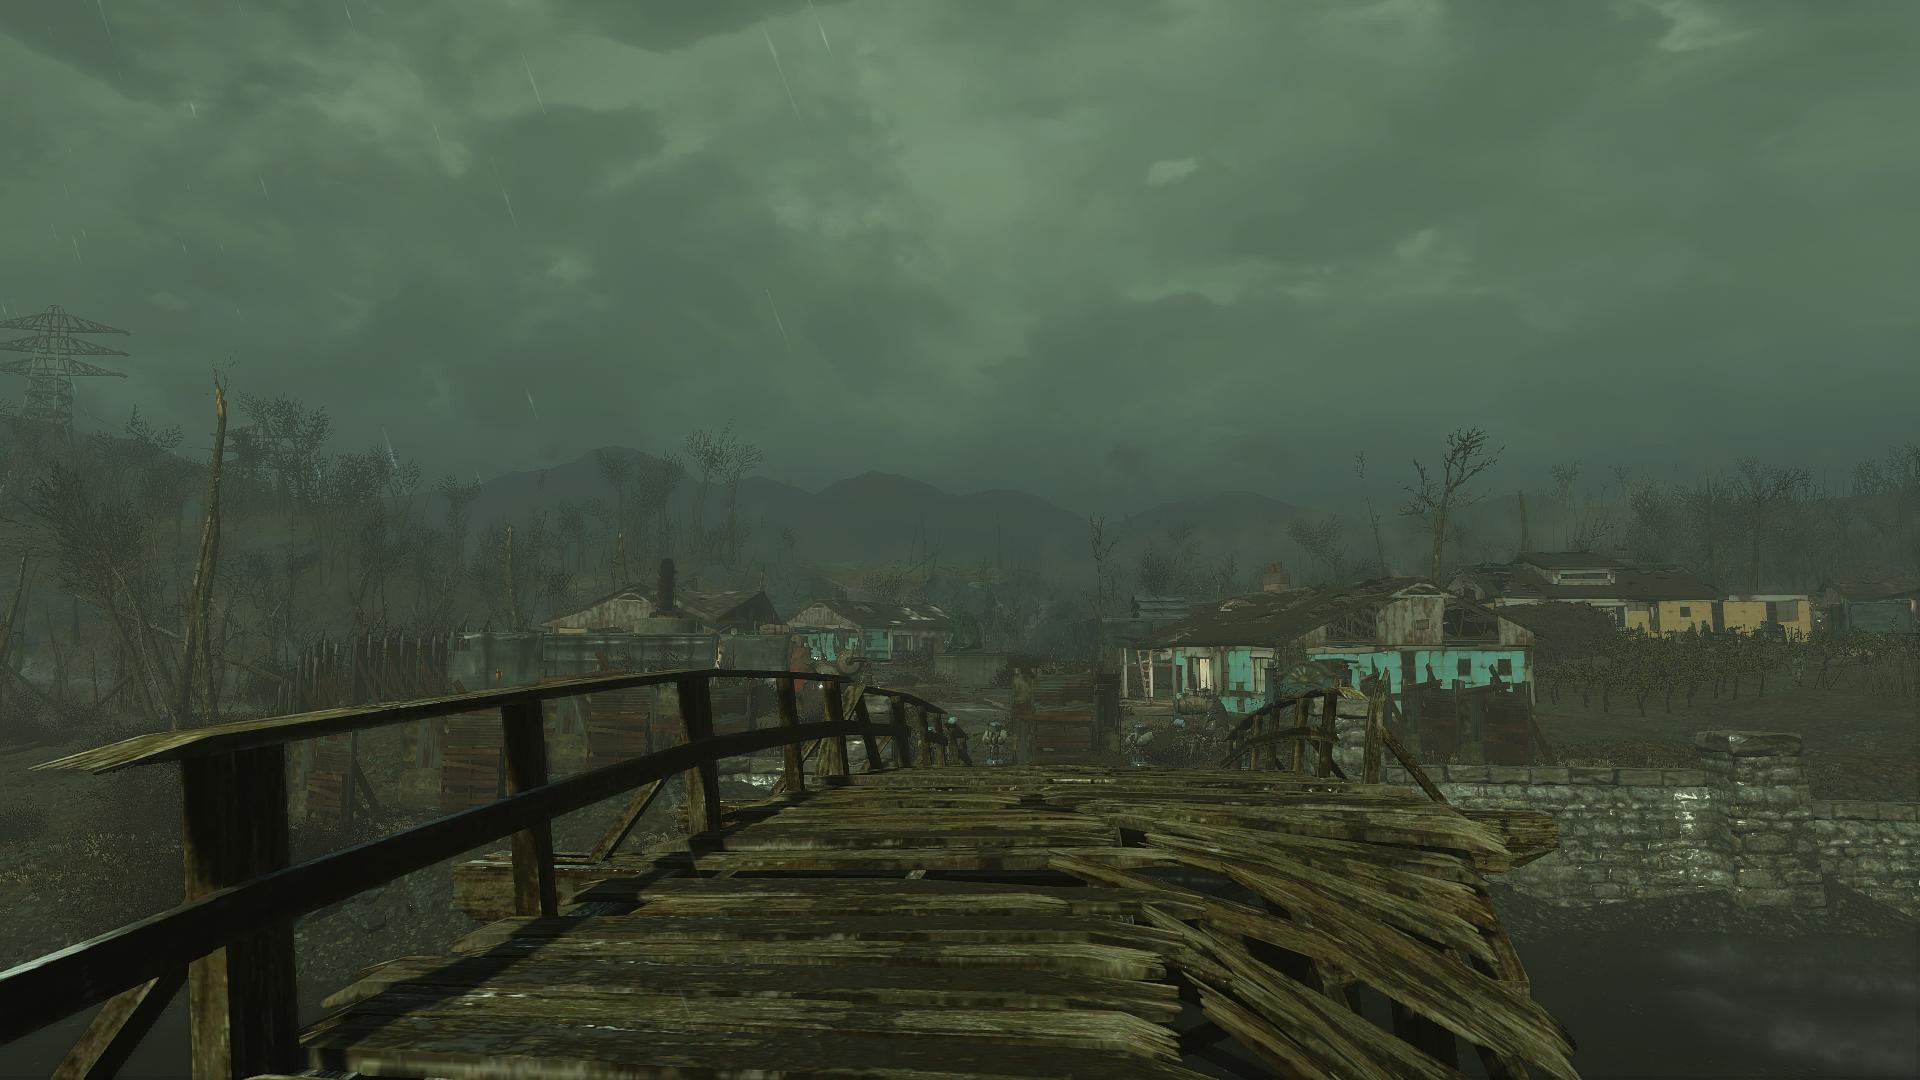 000499.Jpg - Fallout 4